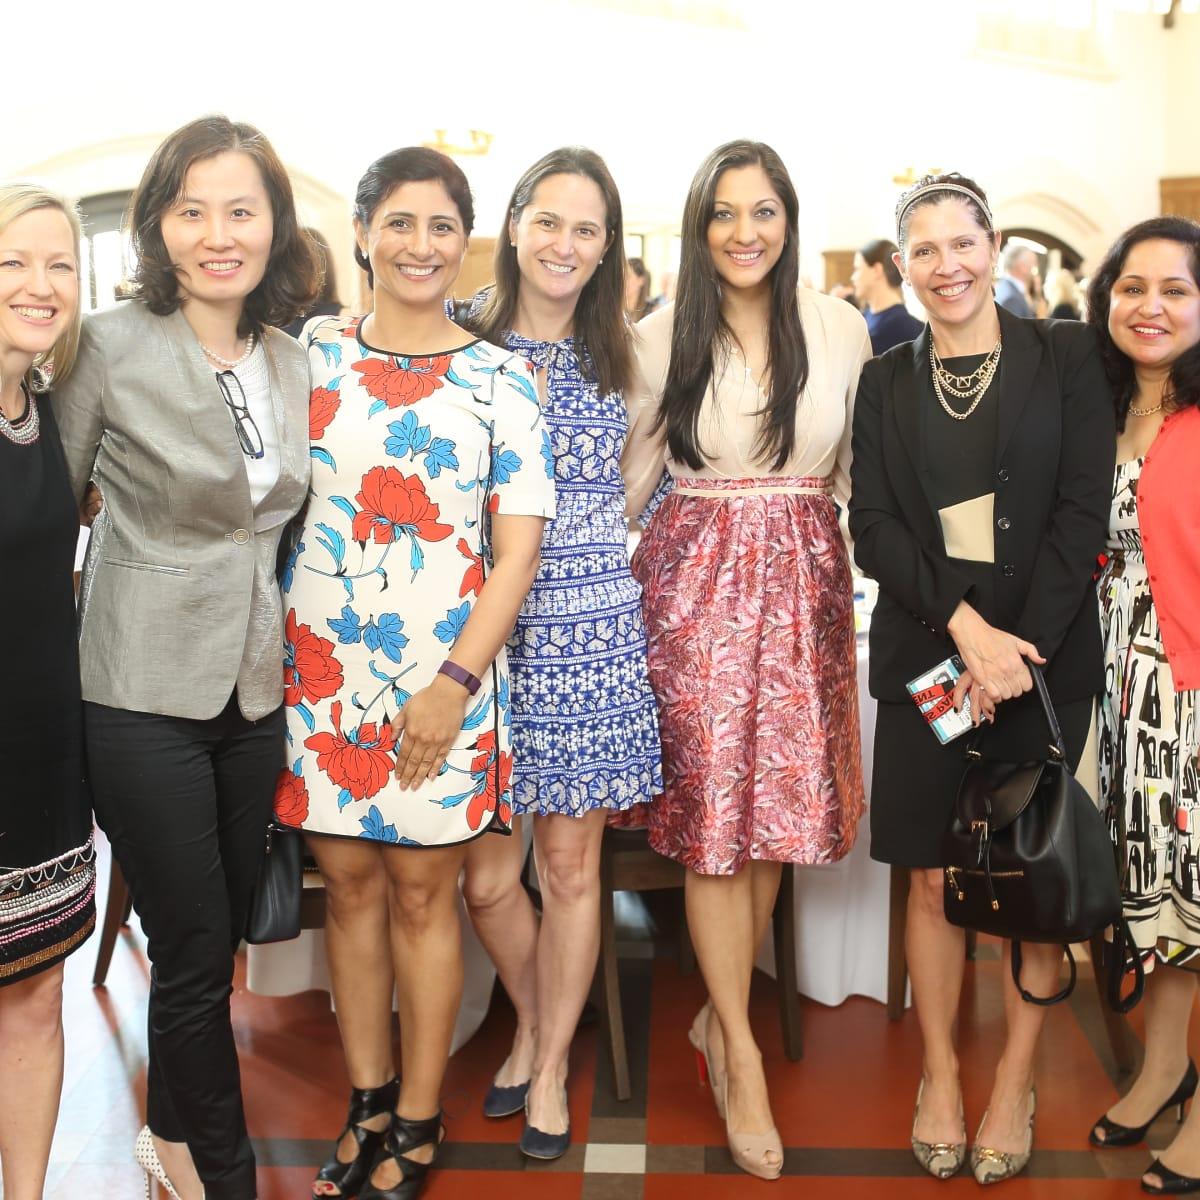 Breakthrough Houston, March 2016, Janice Nicholson_Yao Shen_Preity Bhagia_Pery Shure, Sippi Khurana, Michelle Miller, Nita Singhal